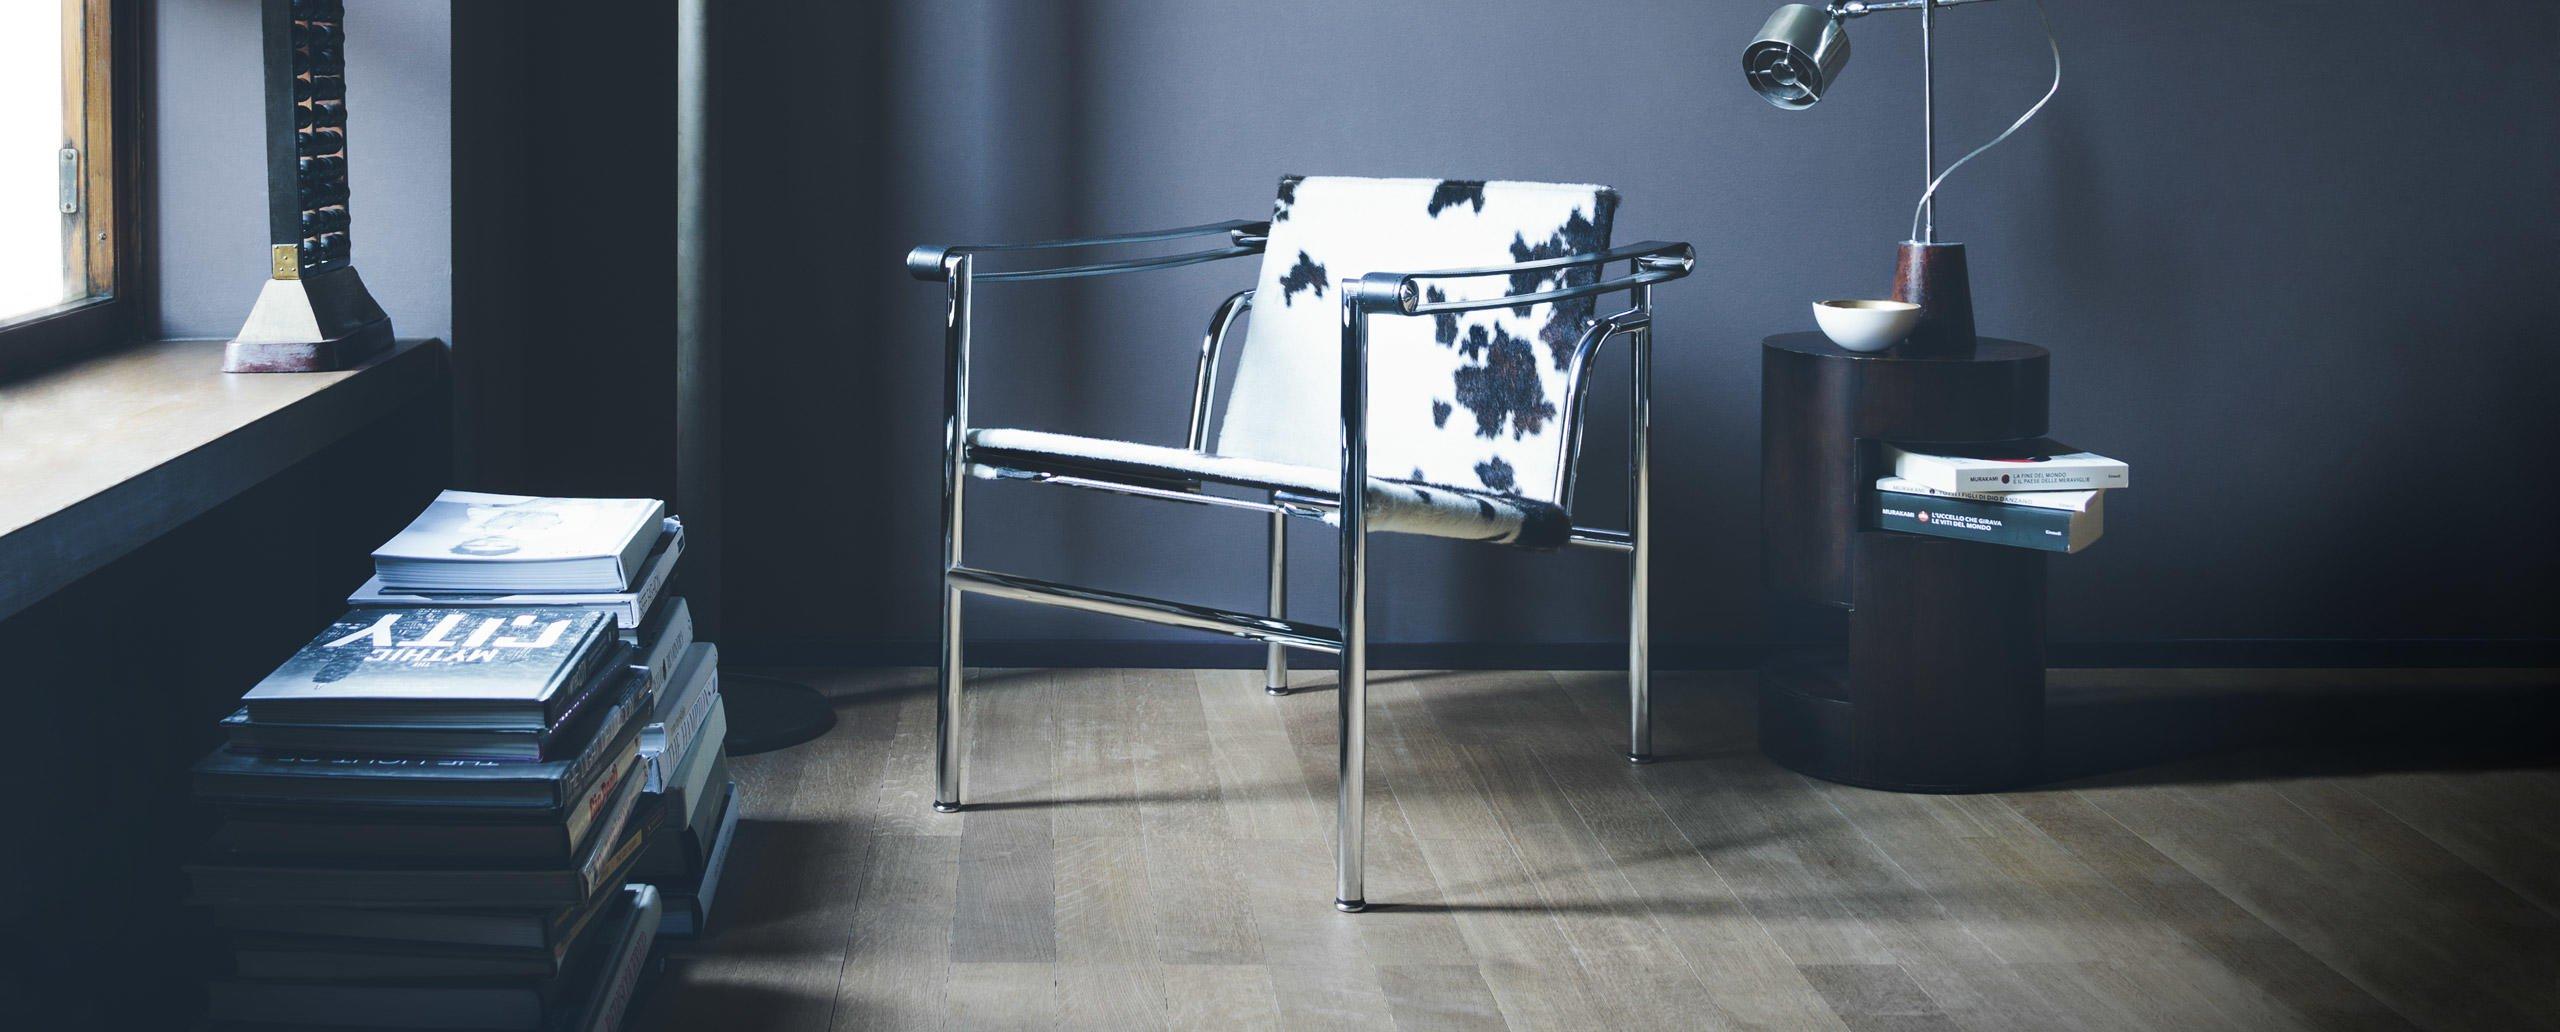 inspiration bauhaus le corbusier stuhl lc1 ein. Black Bedroom Furniture Sets. Home Design Ideas